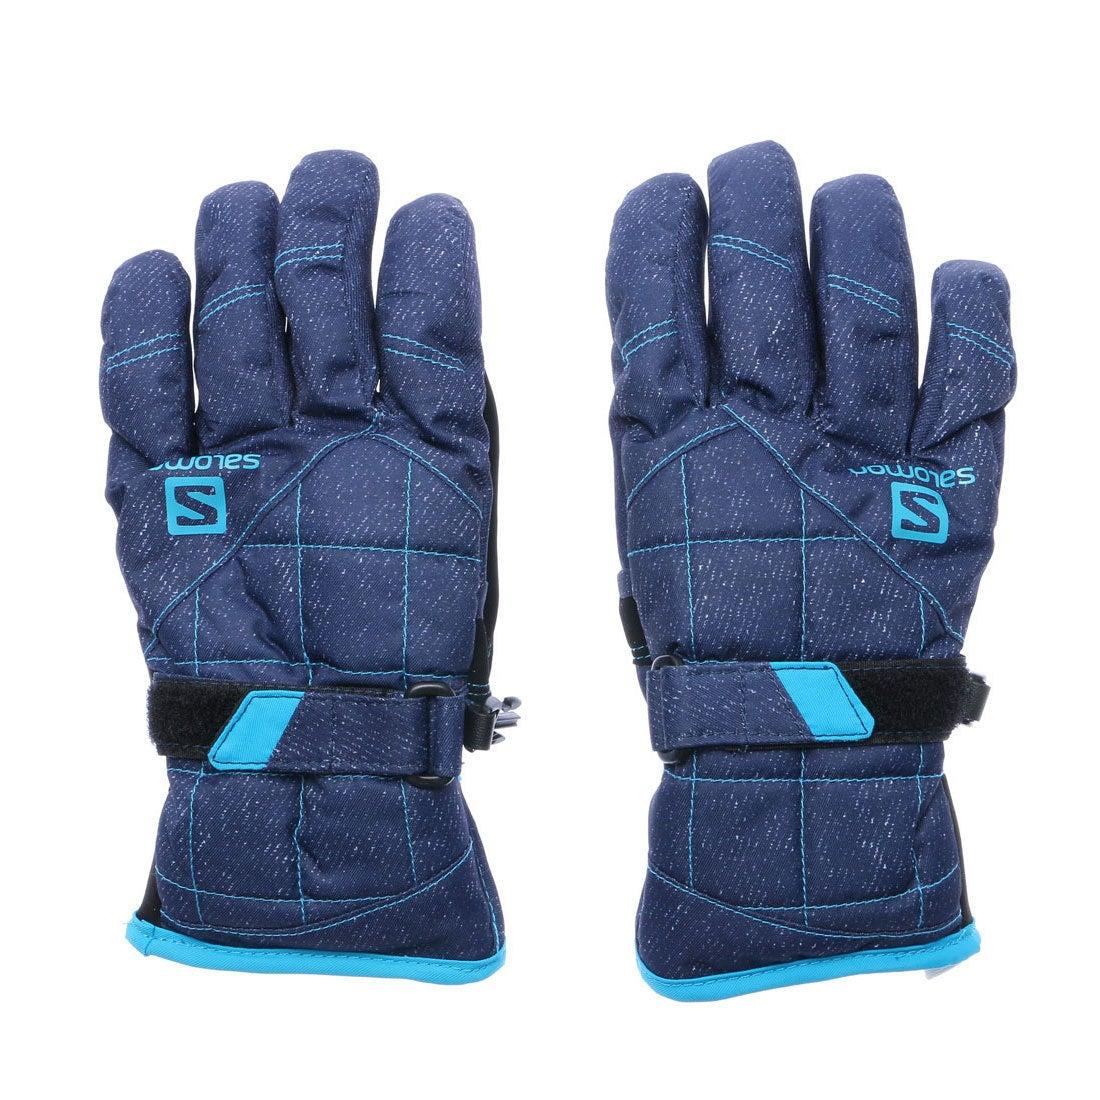 【SALE 30%OFF】サロモン Salomon レディース スキー グローブ JP SALOMON LUAN GLOVE W L40287100